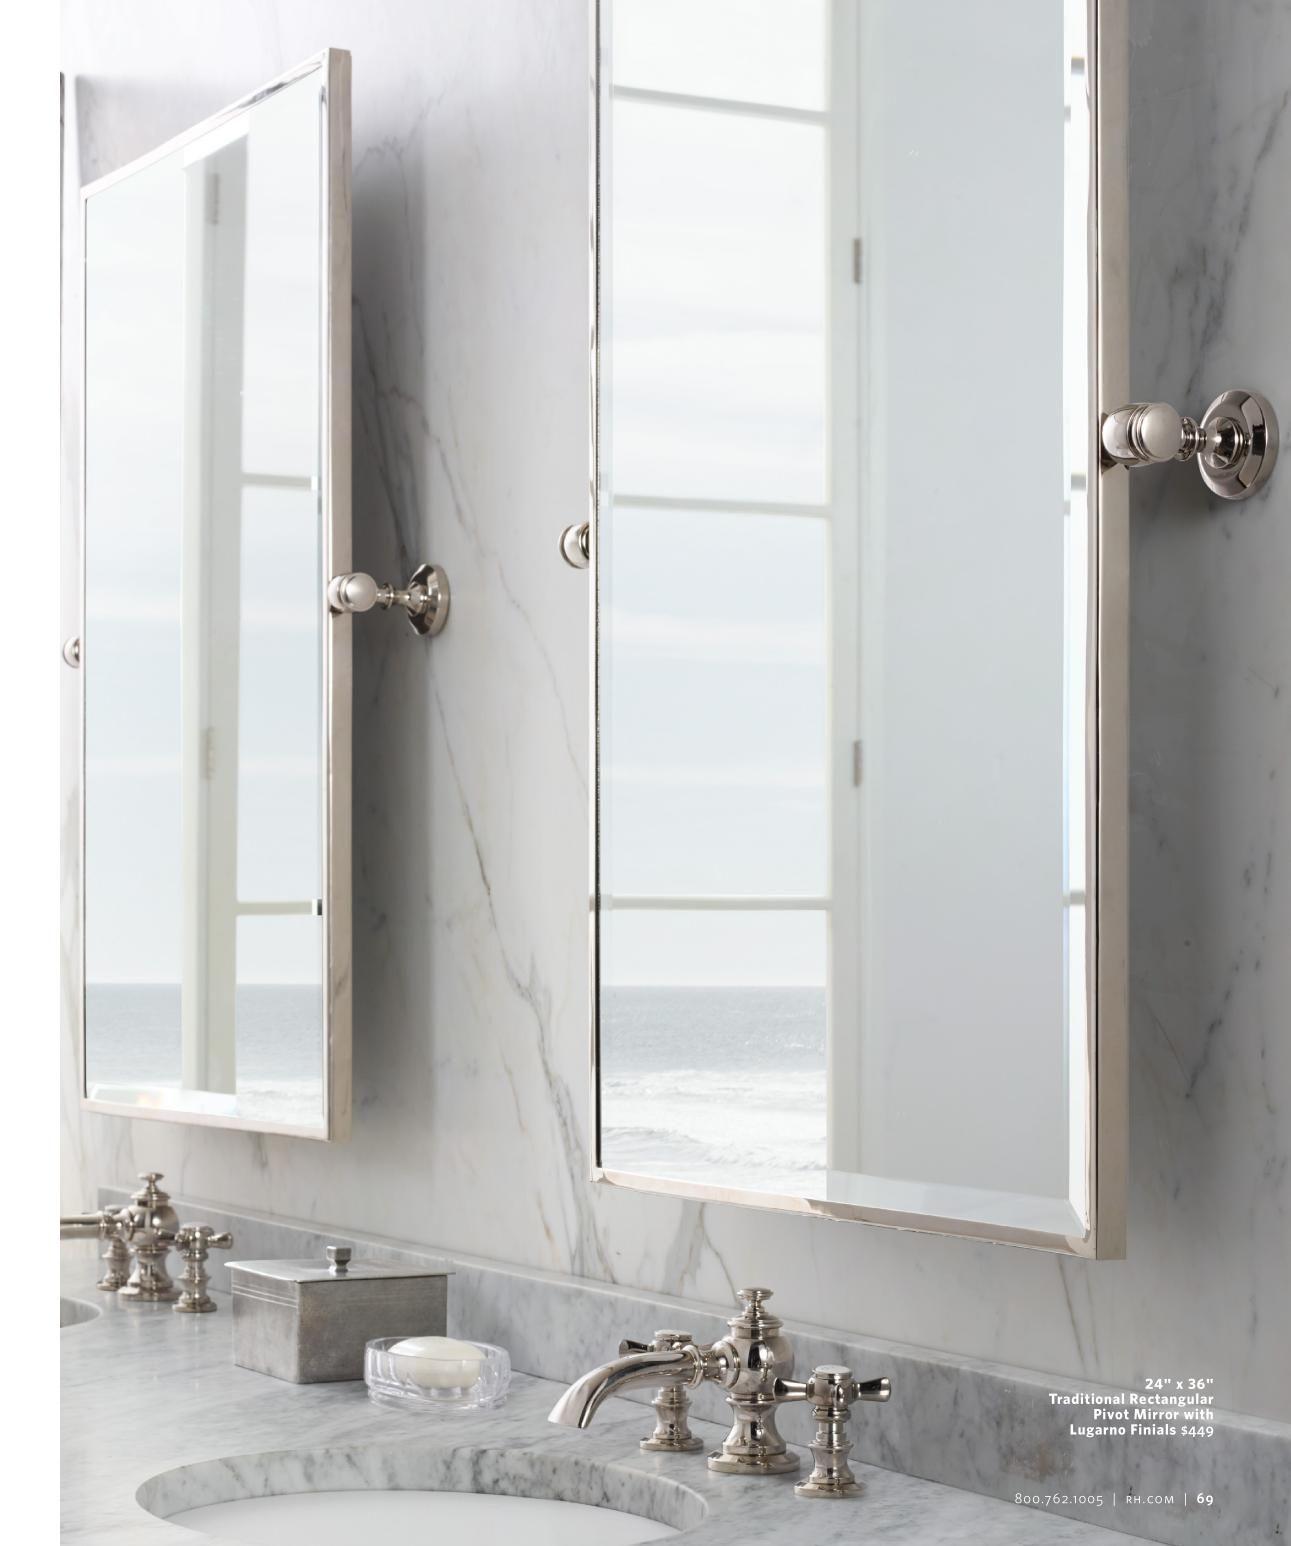 RH Source Books | Restoration Hardware | Pinterest | Bathroom ...